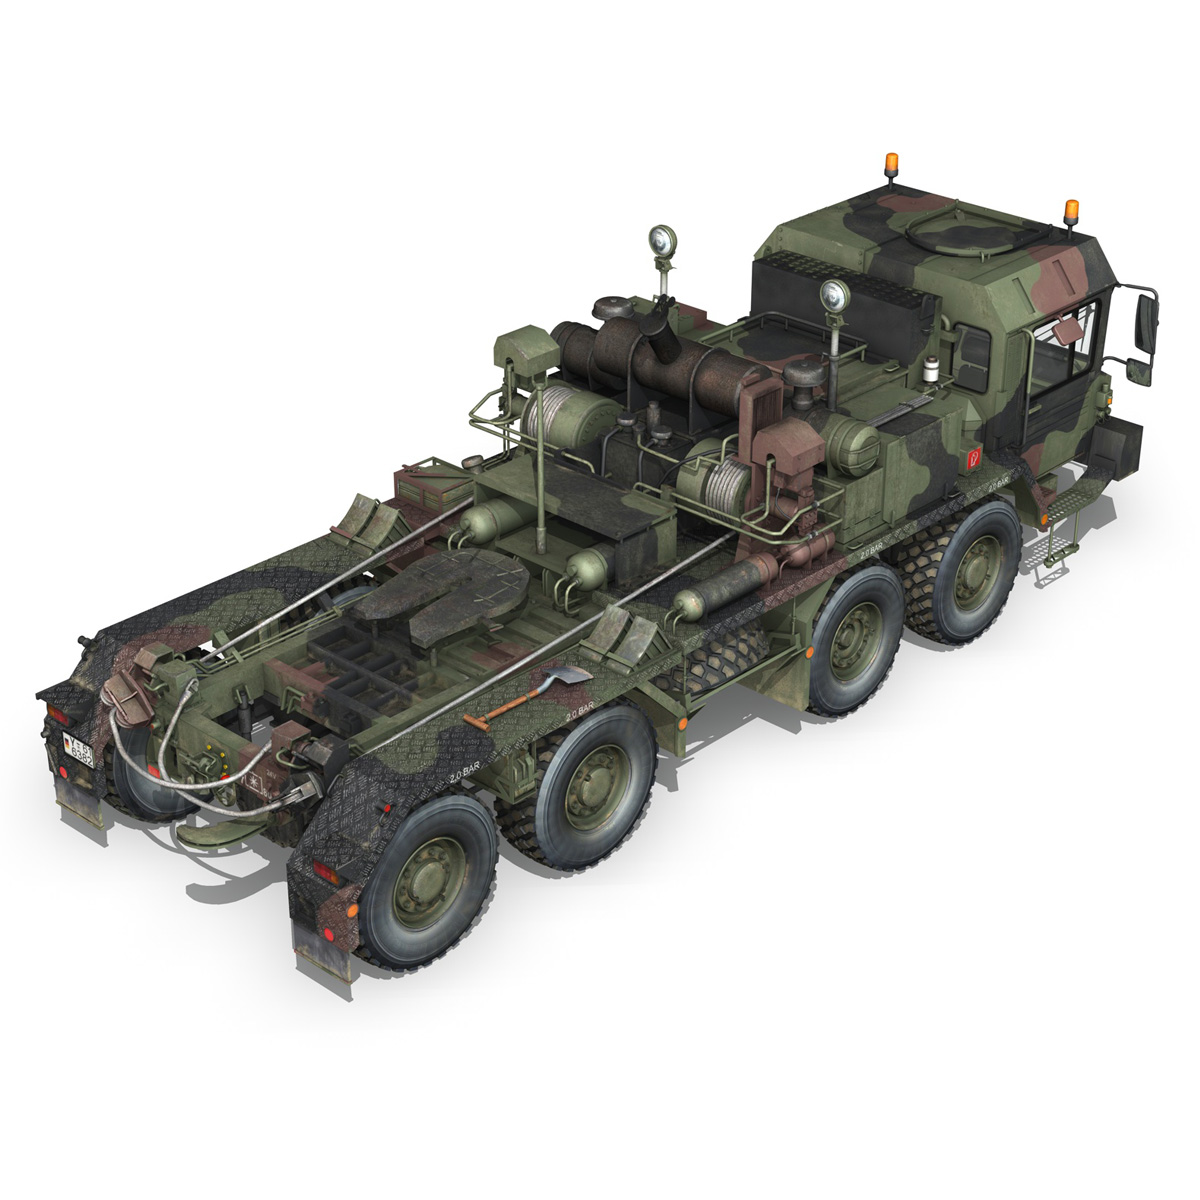 faun stl-56 transportues tank 3d model 3ds fbx c4d lwo obj 201914